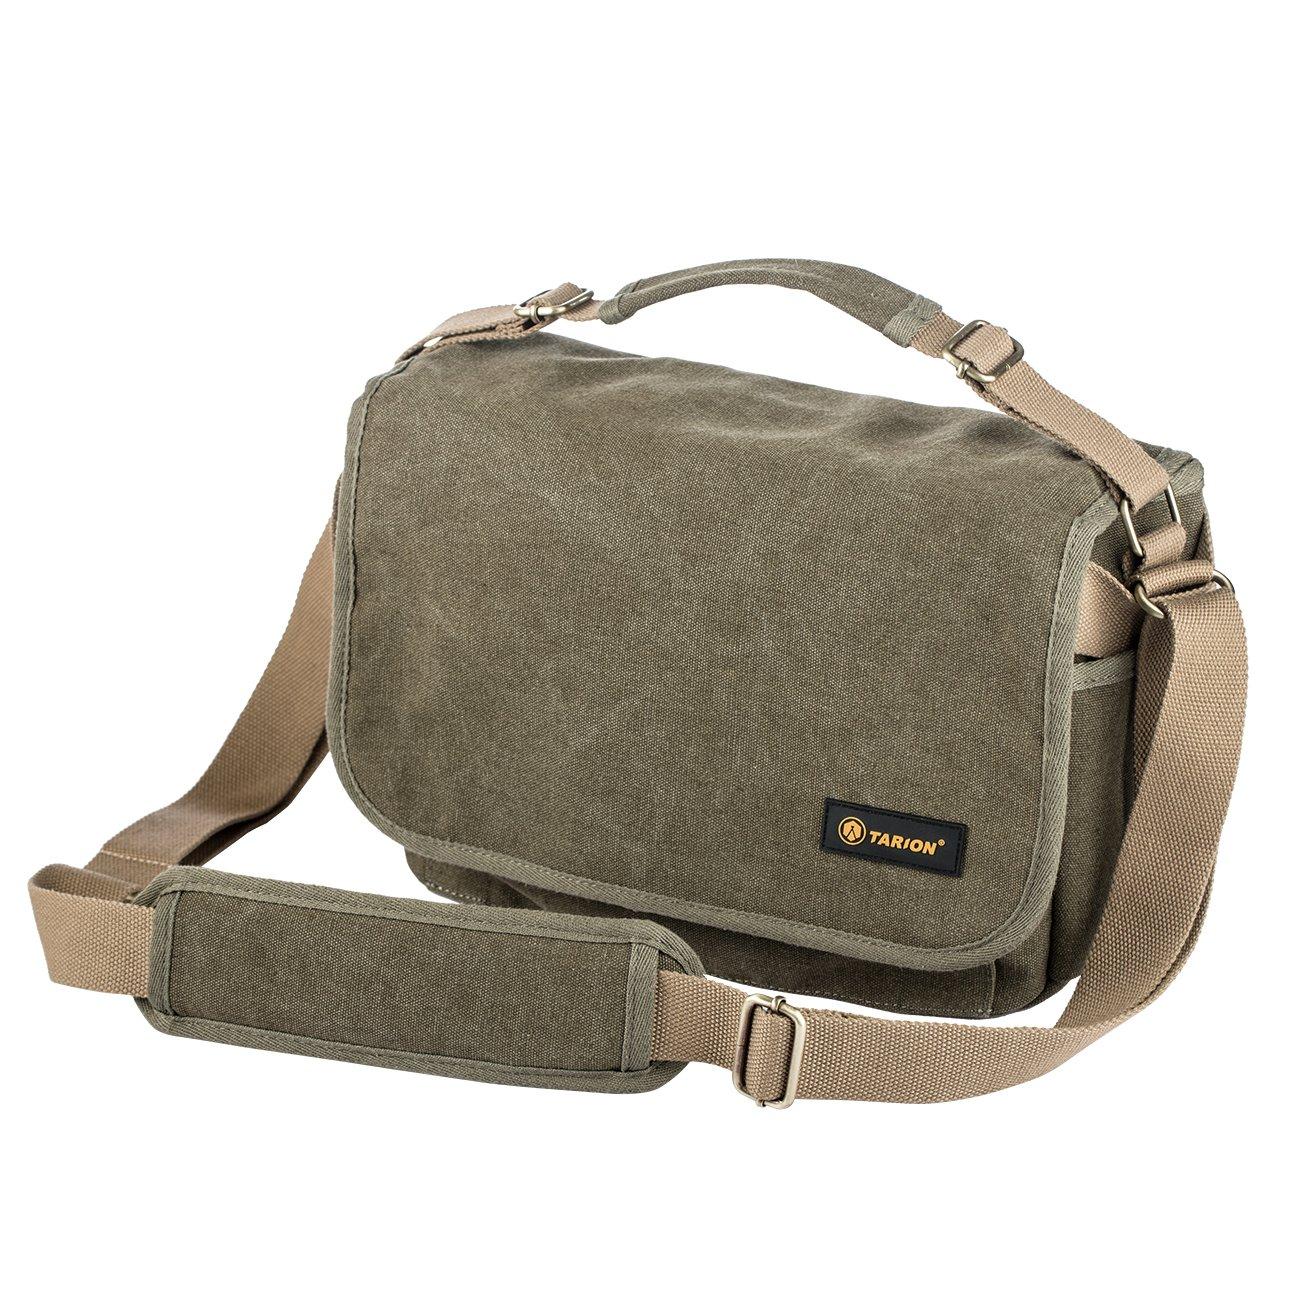 TARION RS-01 Camera Bag Photography Single Shoulder Bag Vintage Water Repellent Canvas Case Bag for DSLR Camera Mirrorless Camera Green